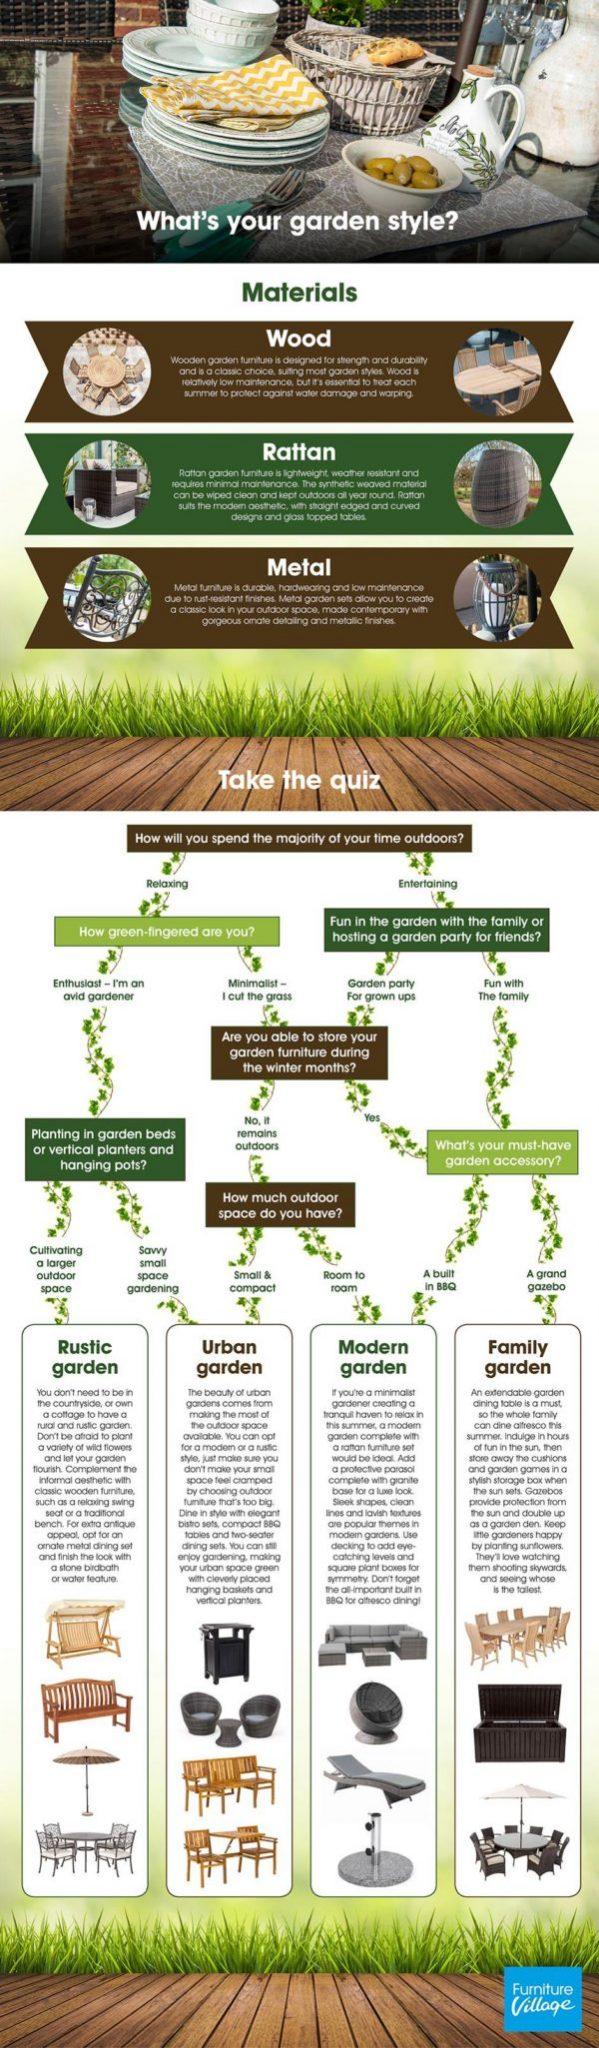 Garden Quiz